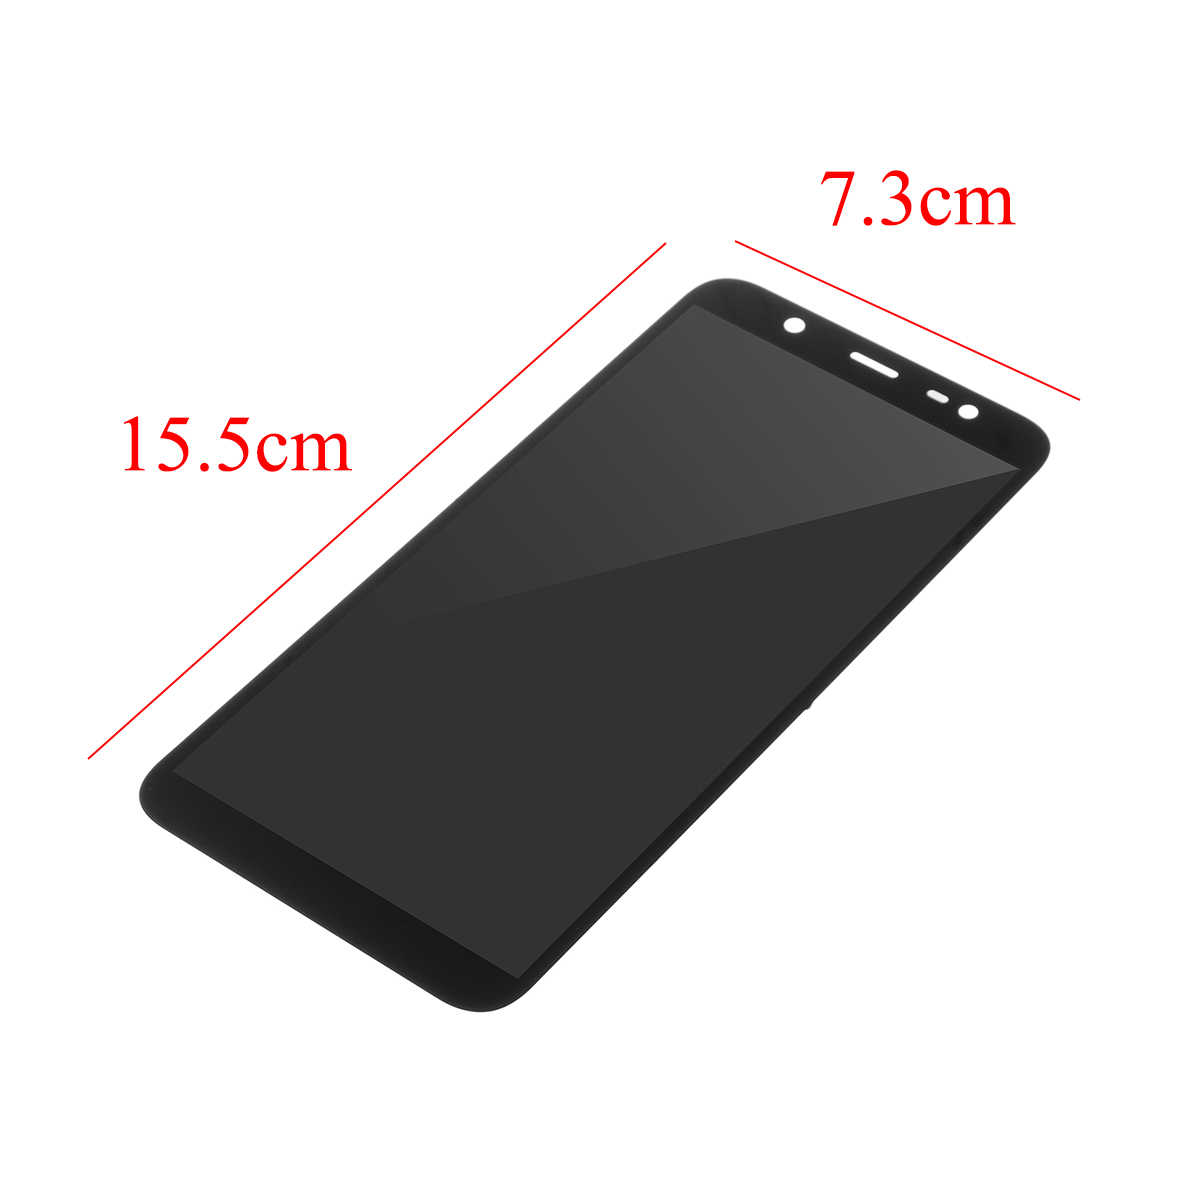 Pantalla LCD + pantalla táctil digitalizador para Samsung para Galaxy J8 J810 2018 de reemplazo con Kit de herramientas de reparación